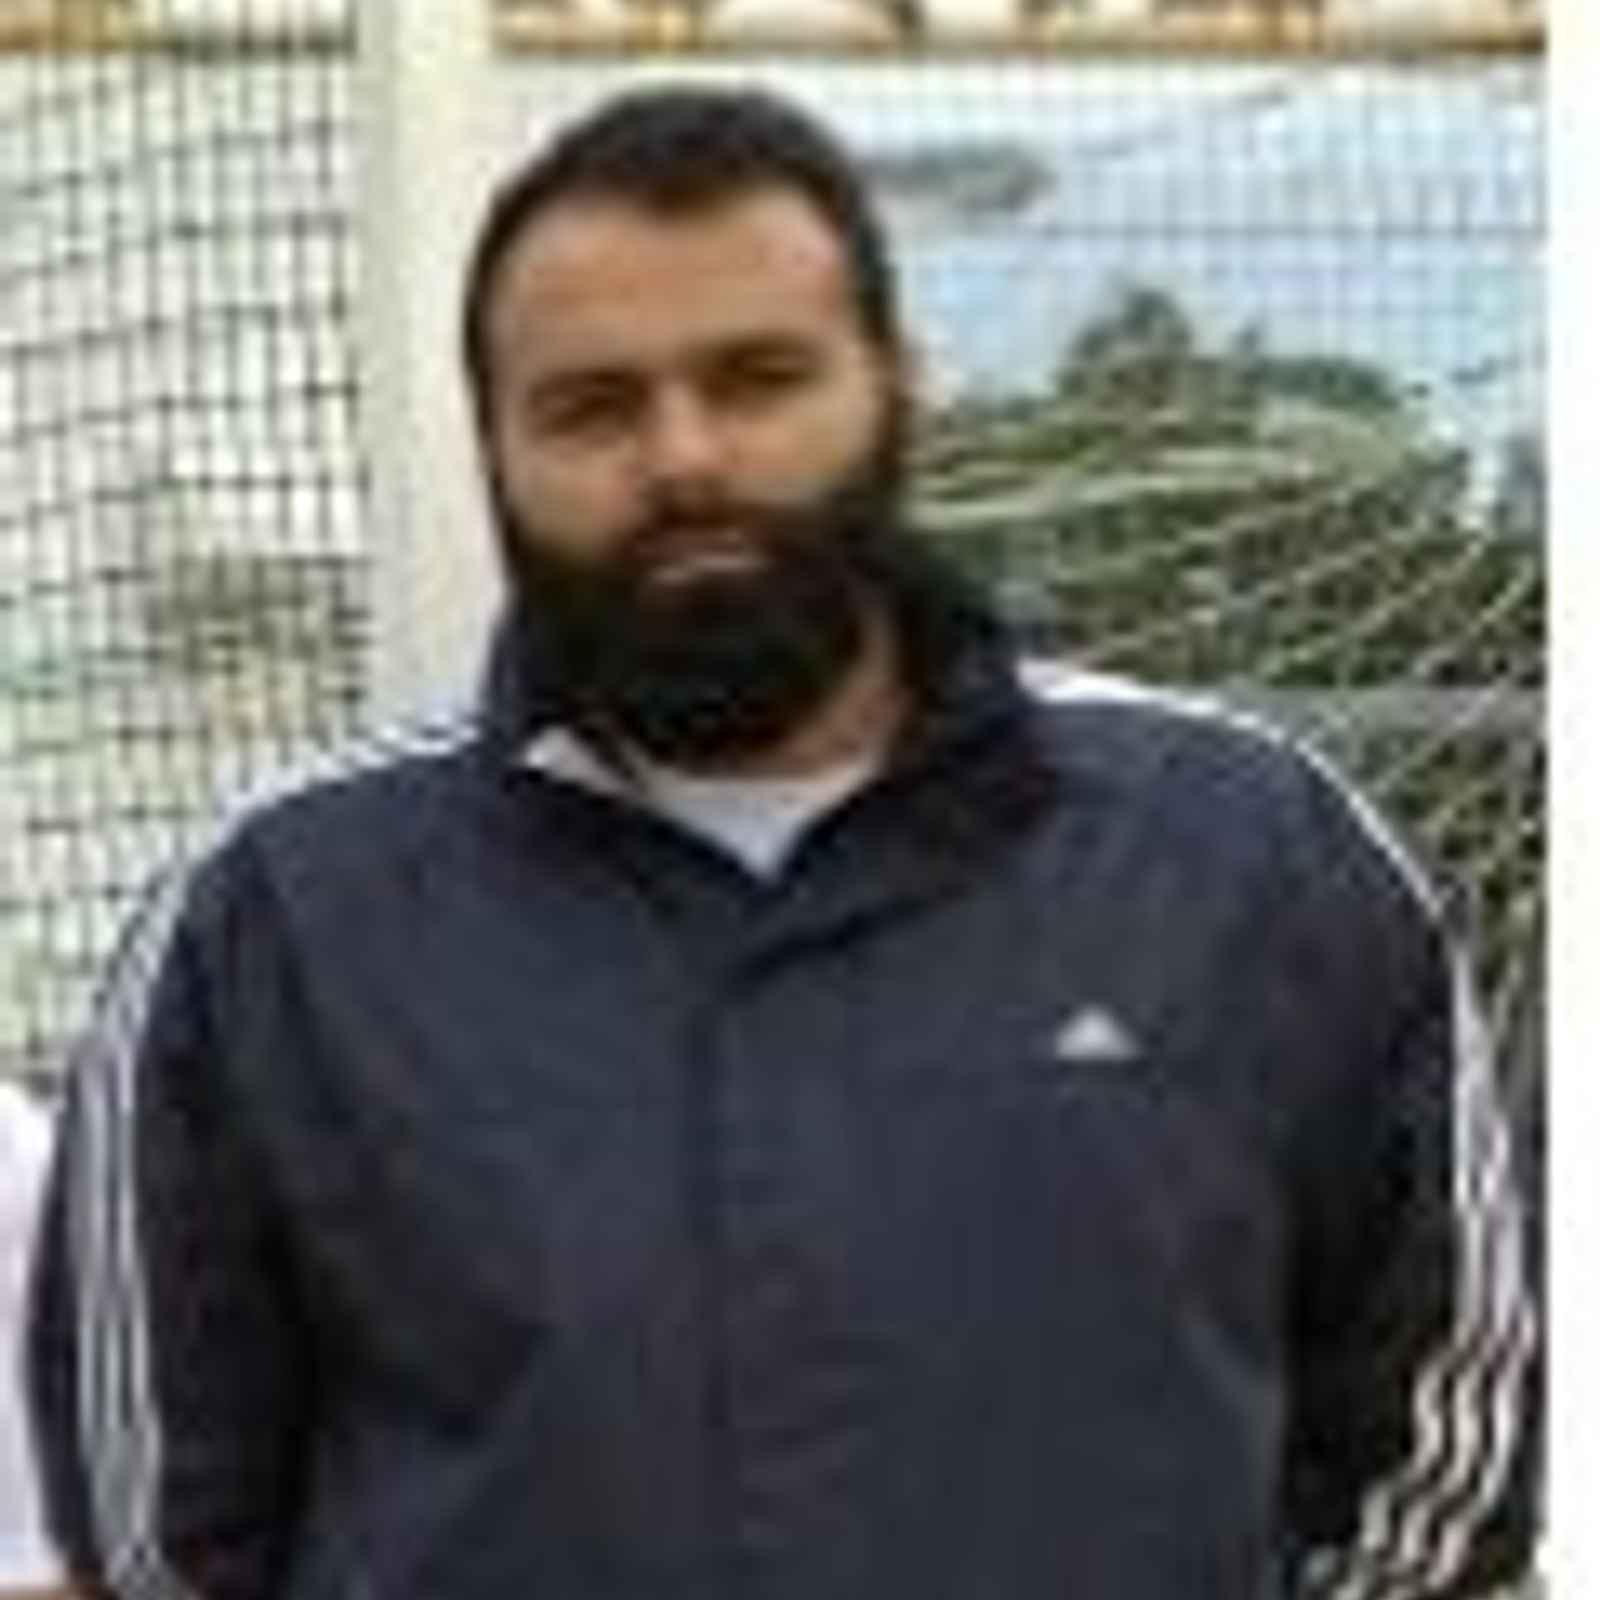 Arfan Akhtar has left Horley HC